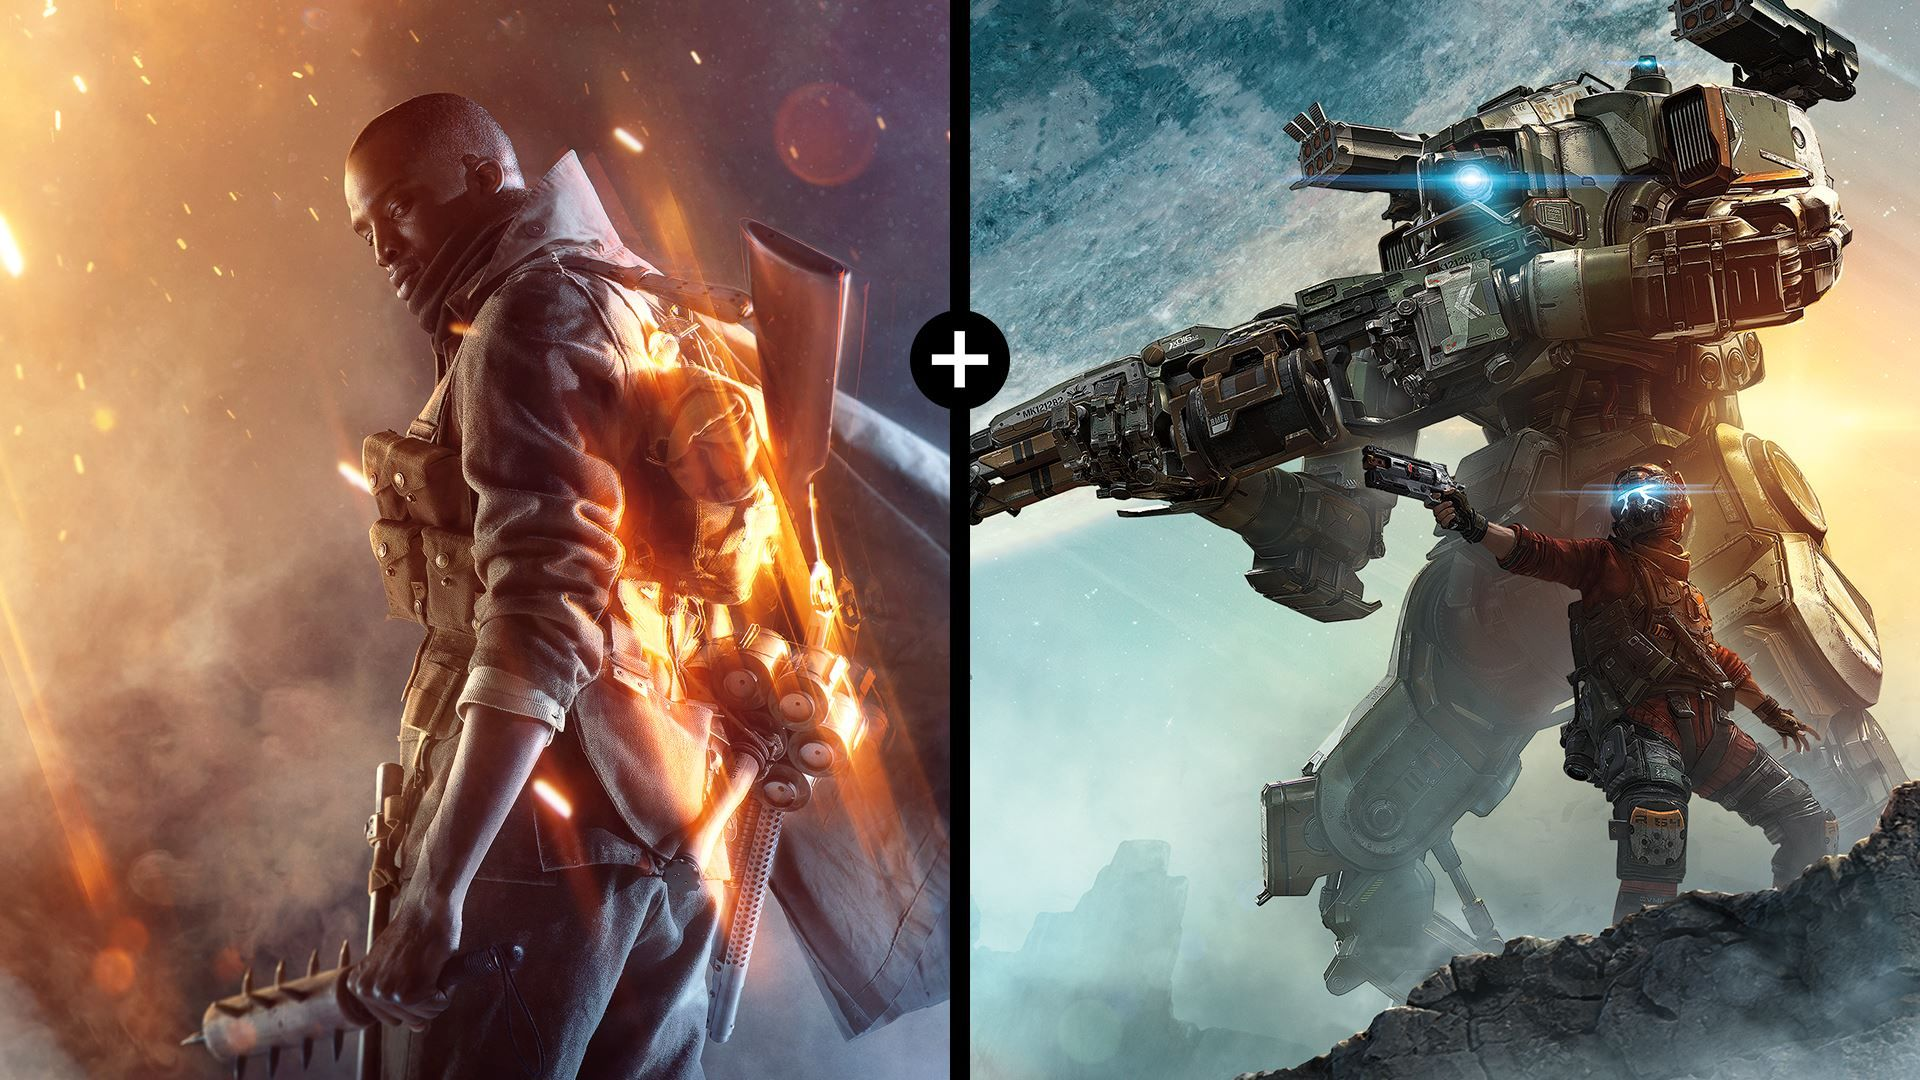 Battlefield 1 - Titanfall 2